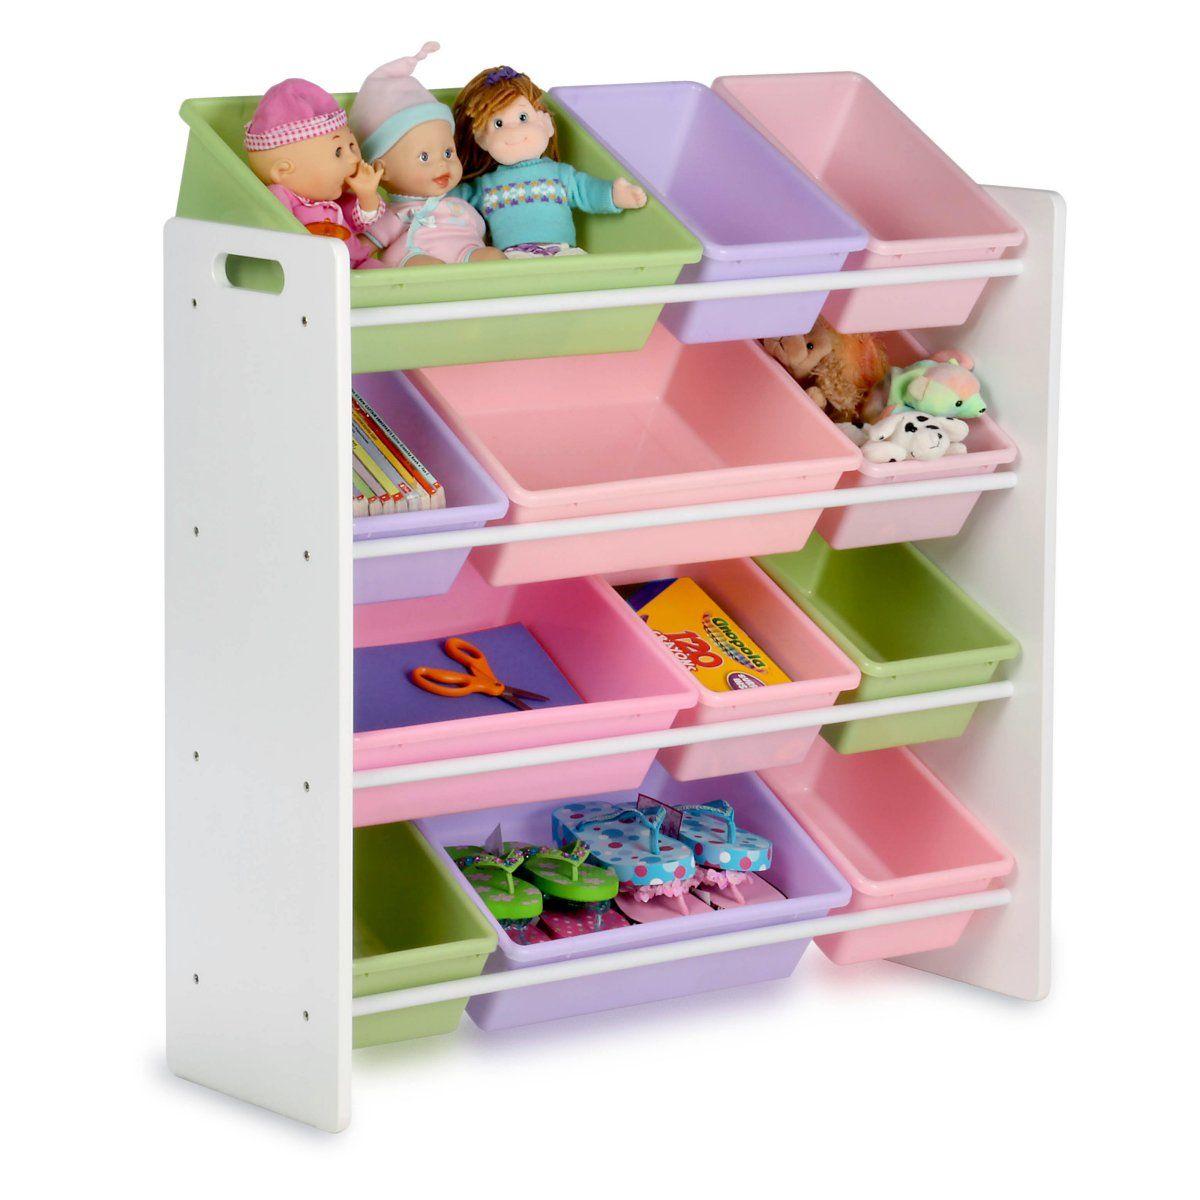 Honey Can Do Kids Storage Organizer 12 Bins White Almacenamiento De Juguetes Para Ninos Organizacion De Juguetes Muebles Para Ninos